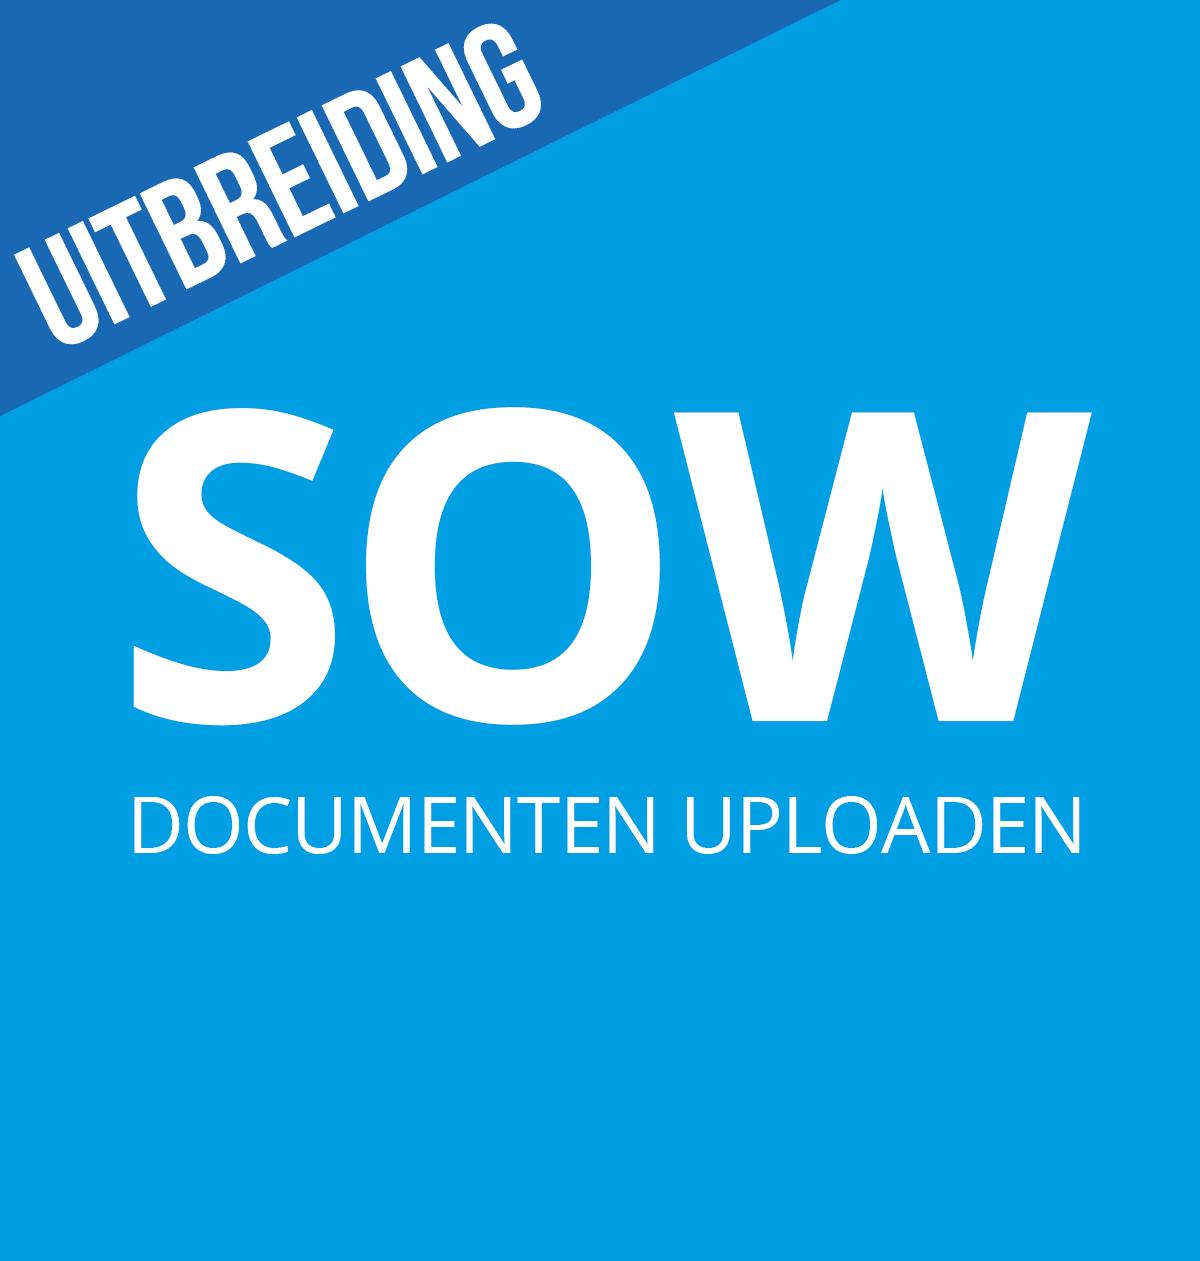 SOW documenten uploaden Netive VMS